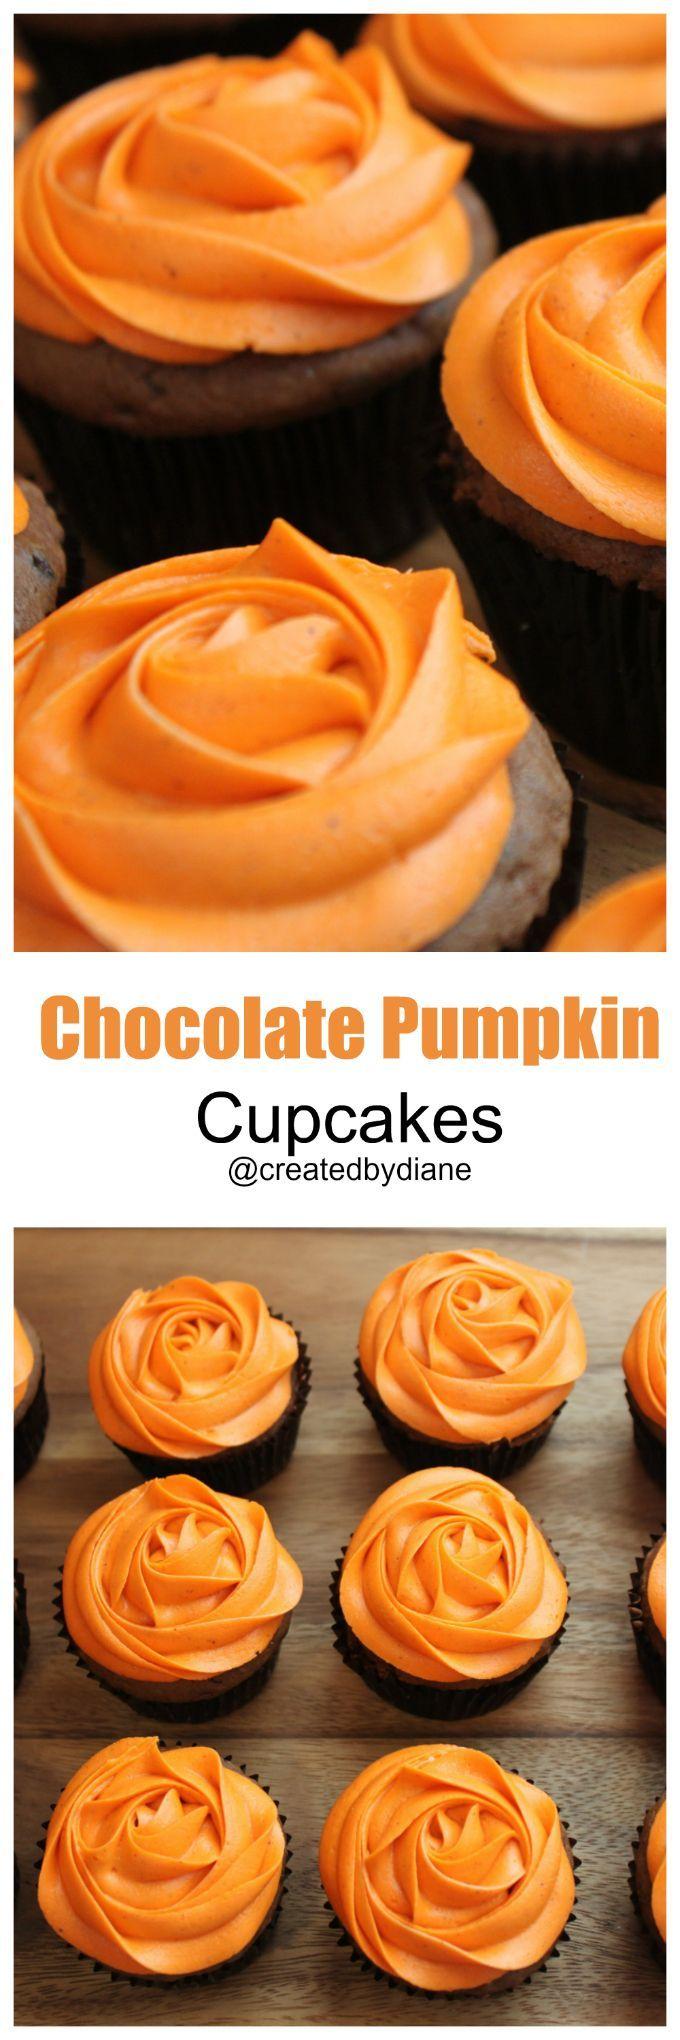 Chocolate Pumpkin Cupcakes Recipe Pumpkins Created By